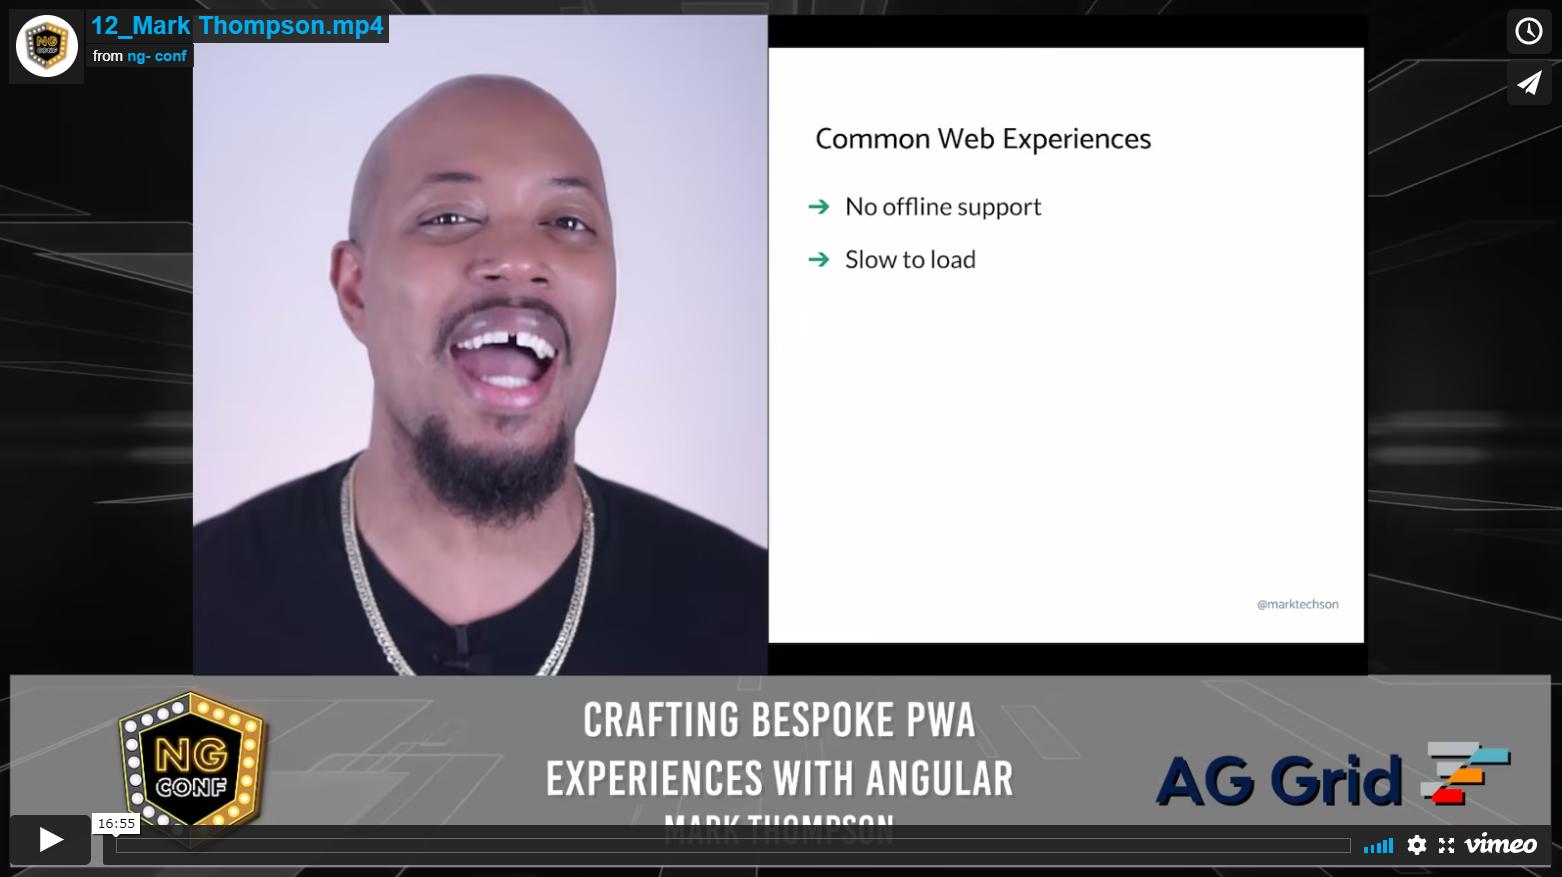 Crafting Bespoke PWA experiences with Angular